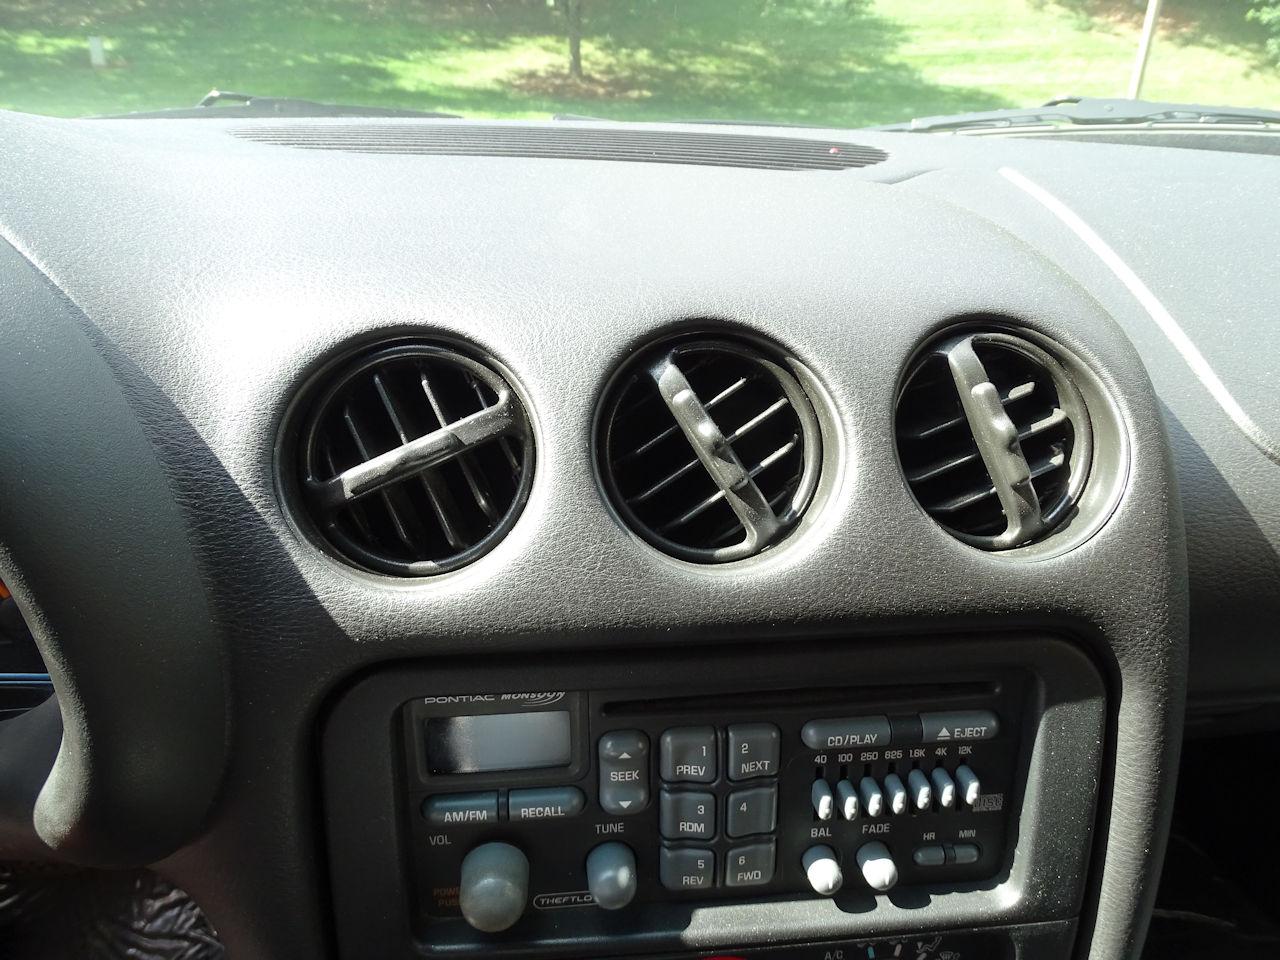 2001 Pontiac Firebird 66